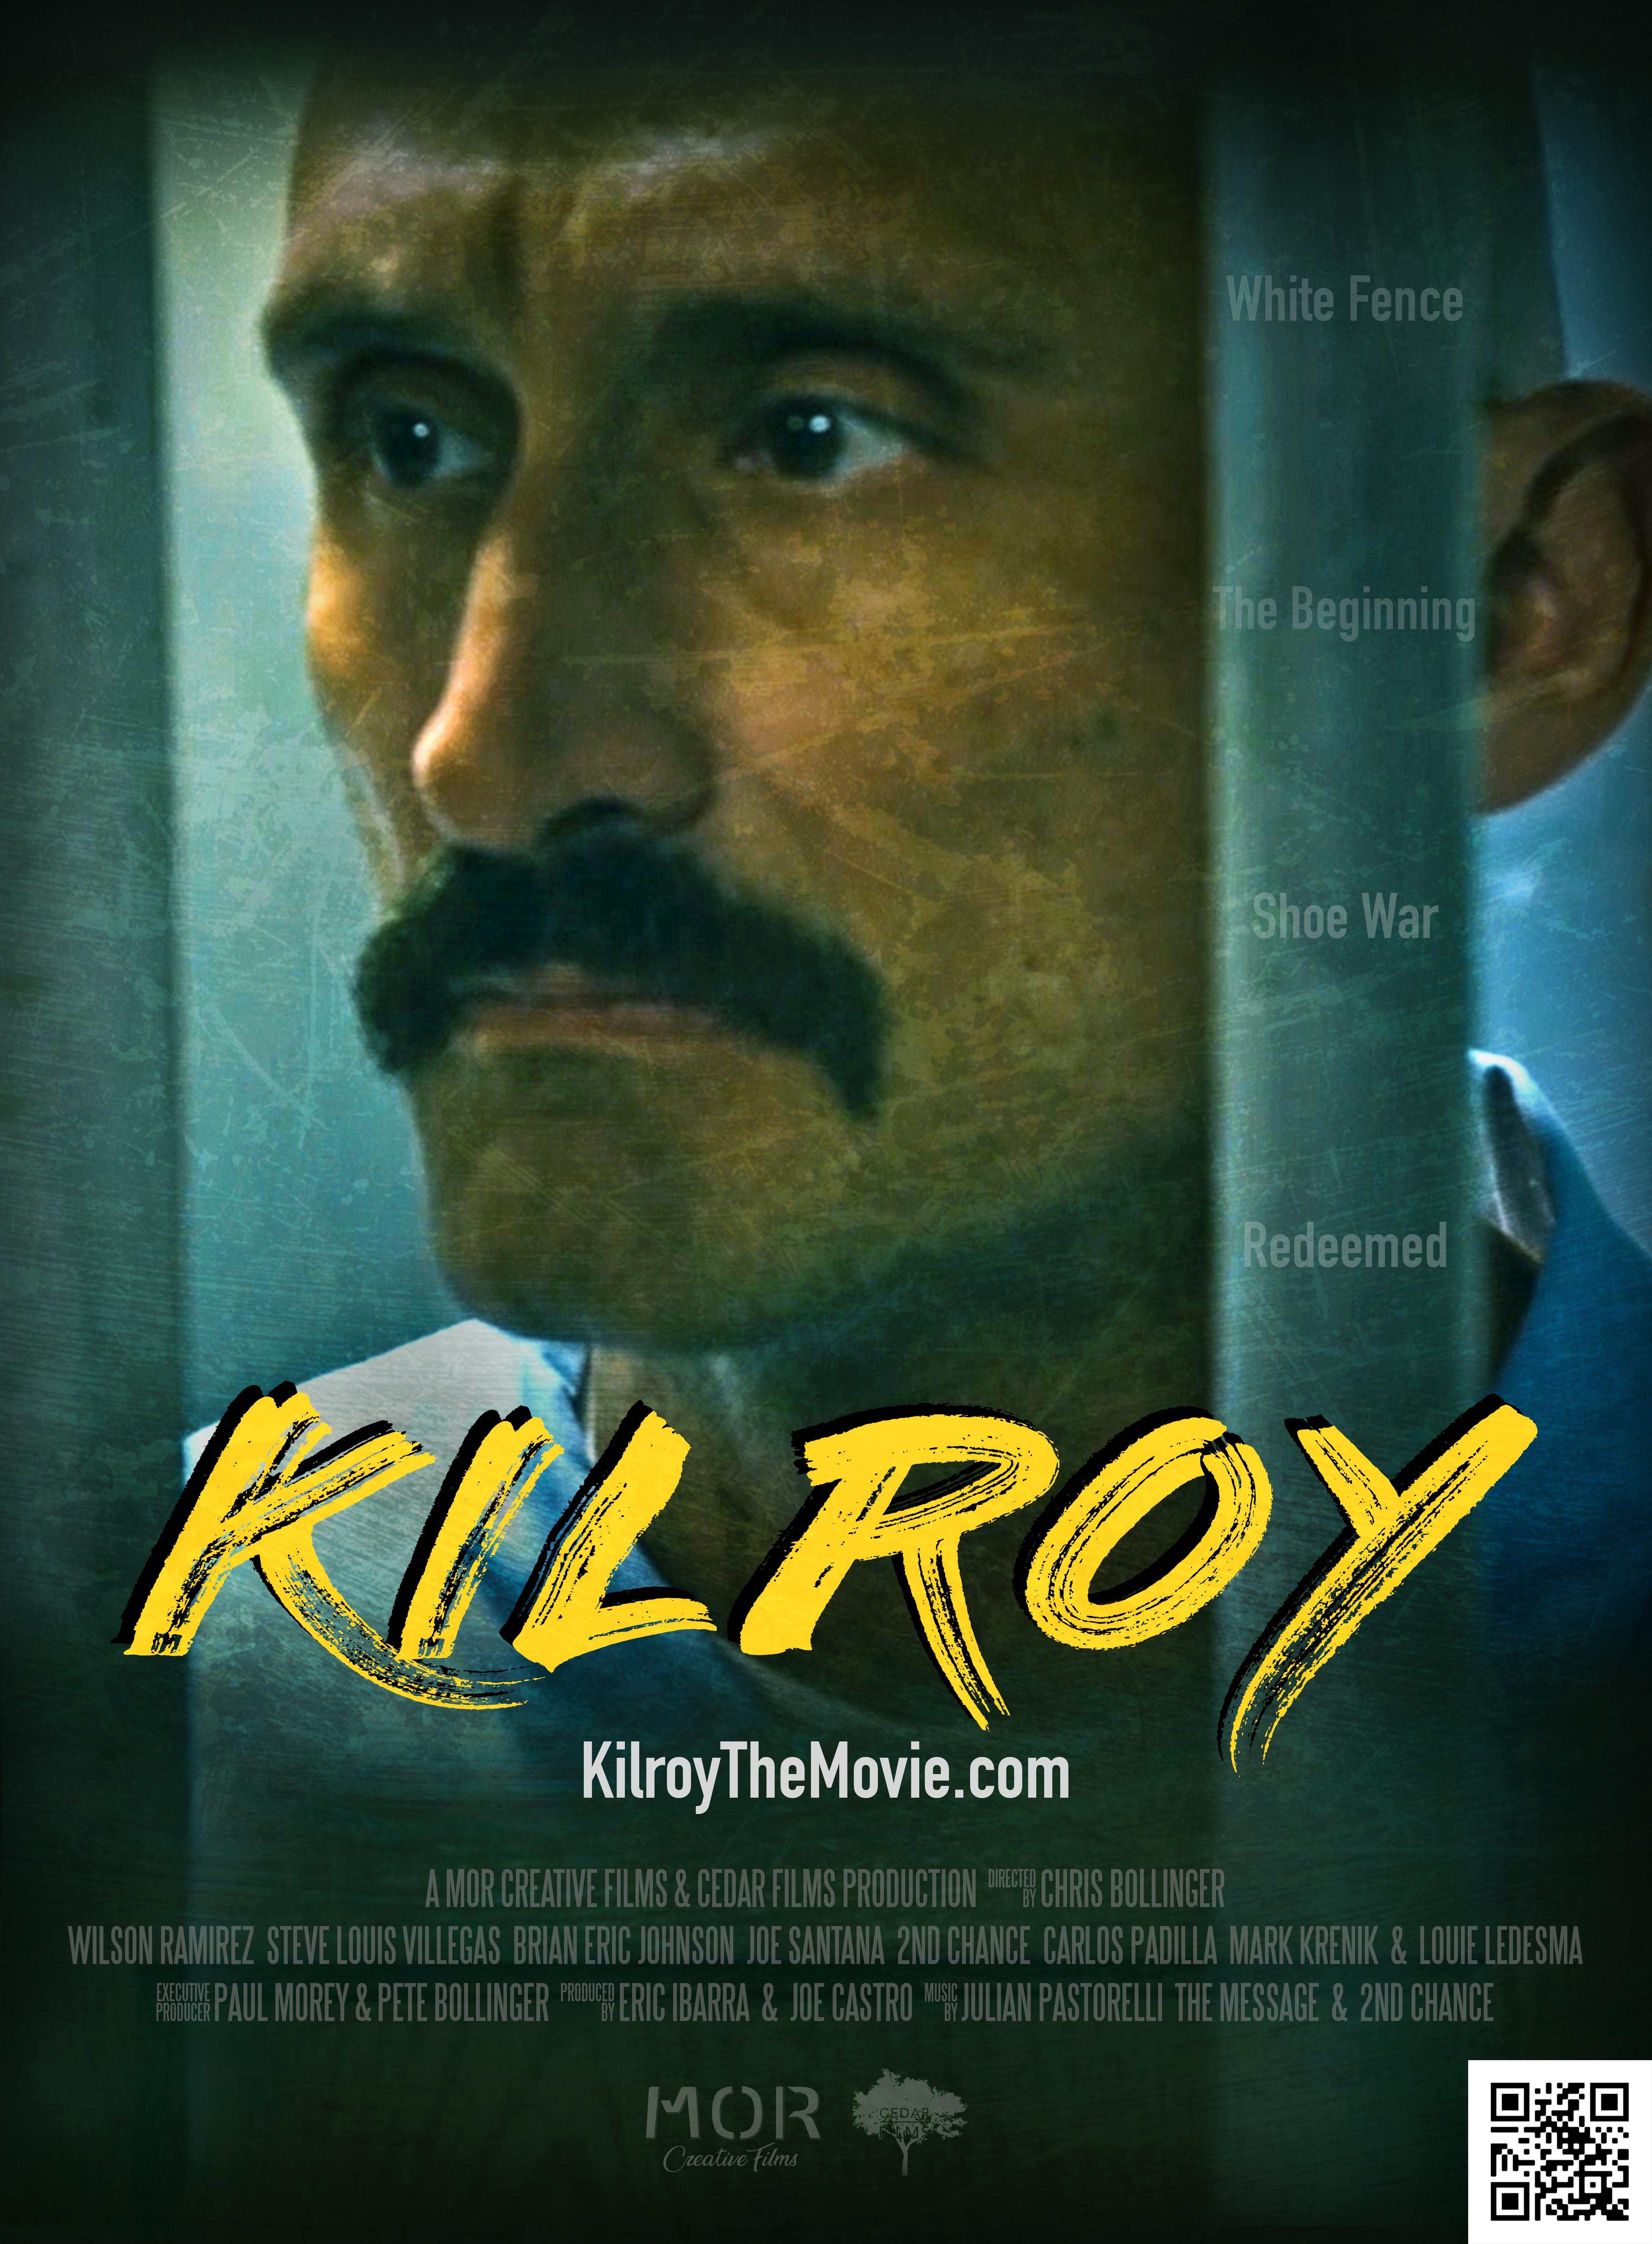 Kilroy hd on soap2day